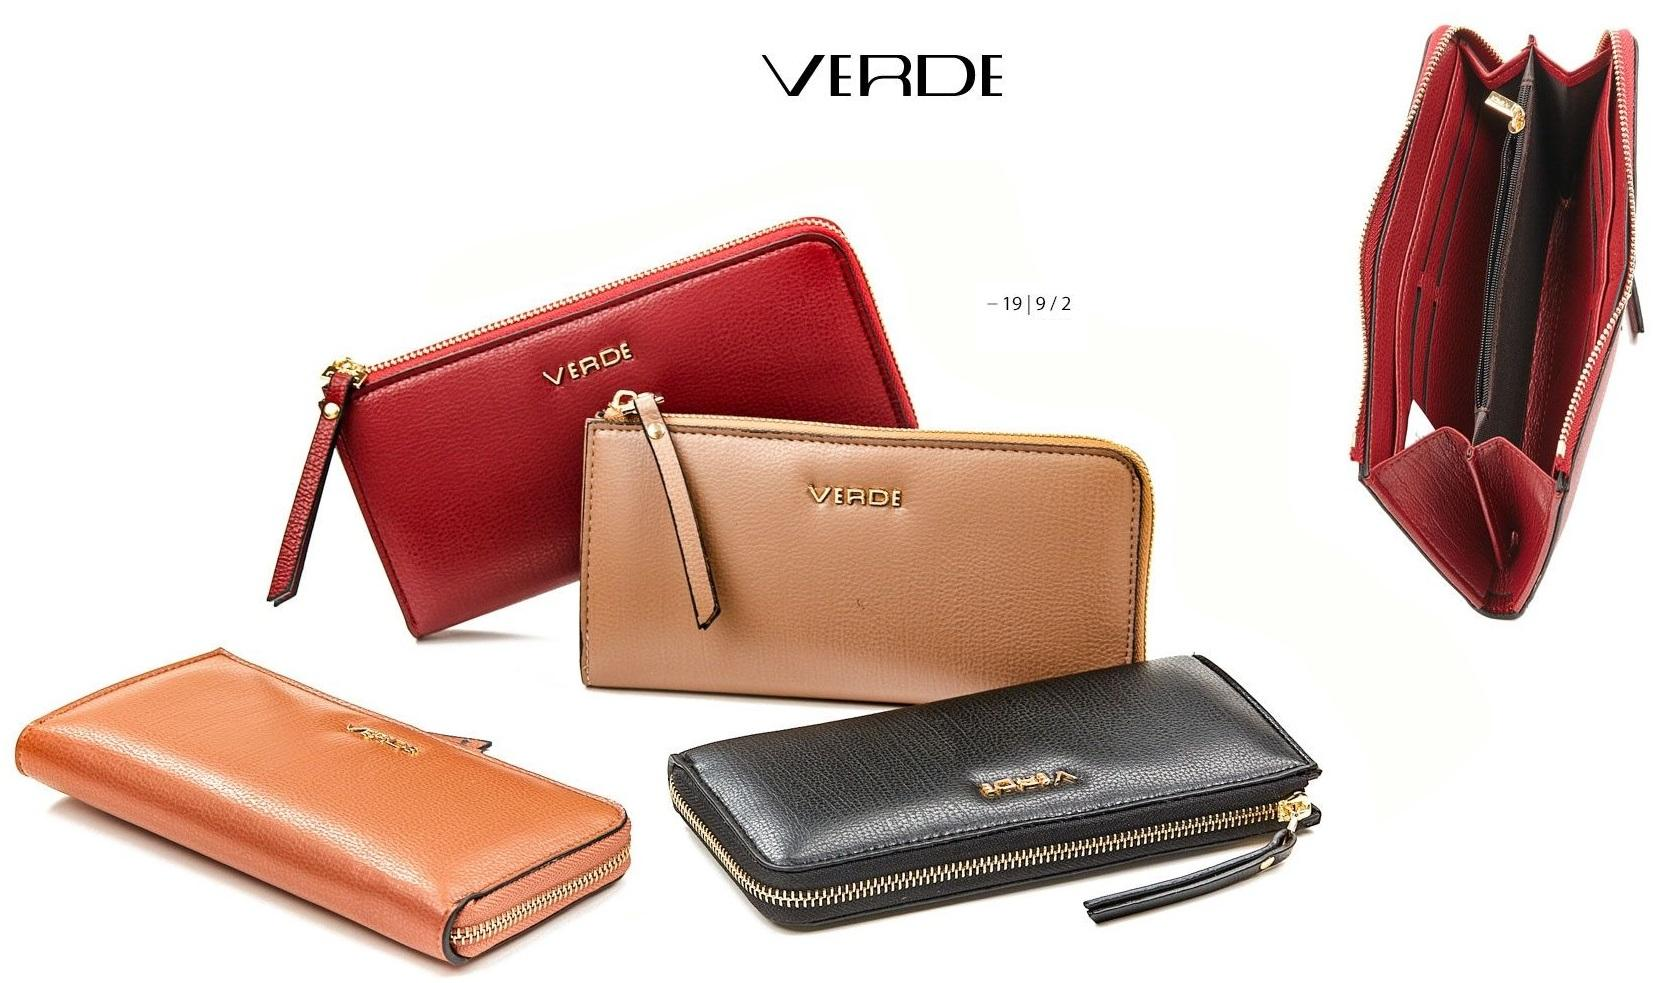 Ladies' wallet bordeaux with zip | Online Autumn/Winter collection